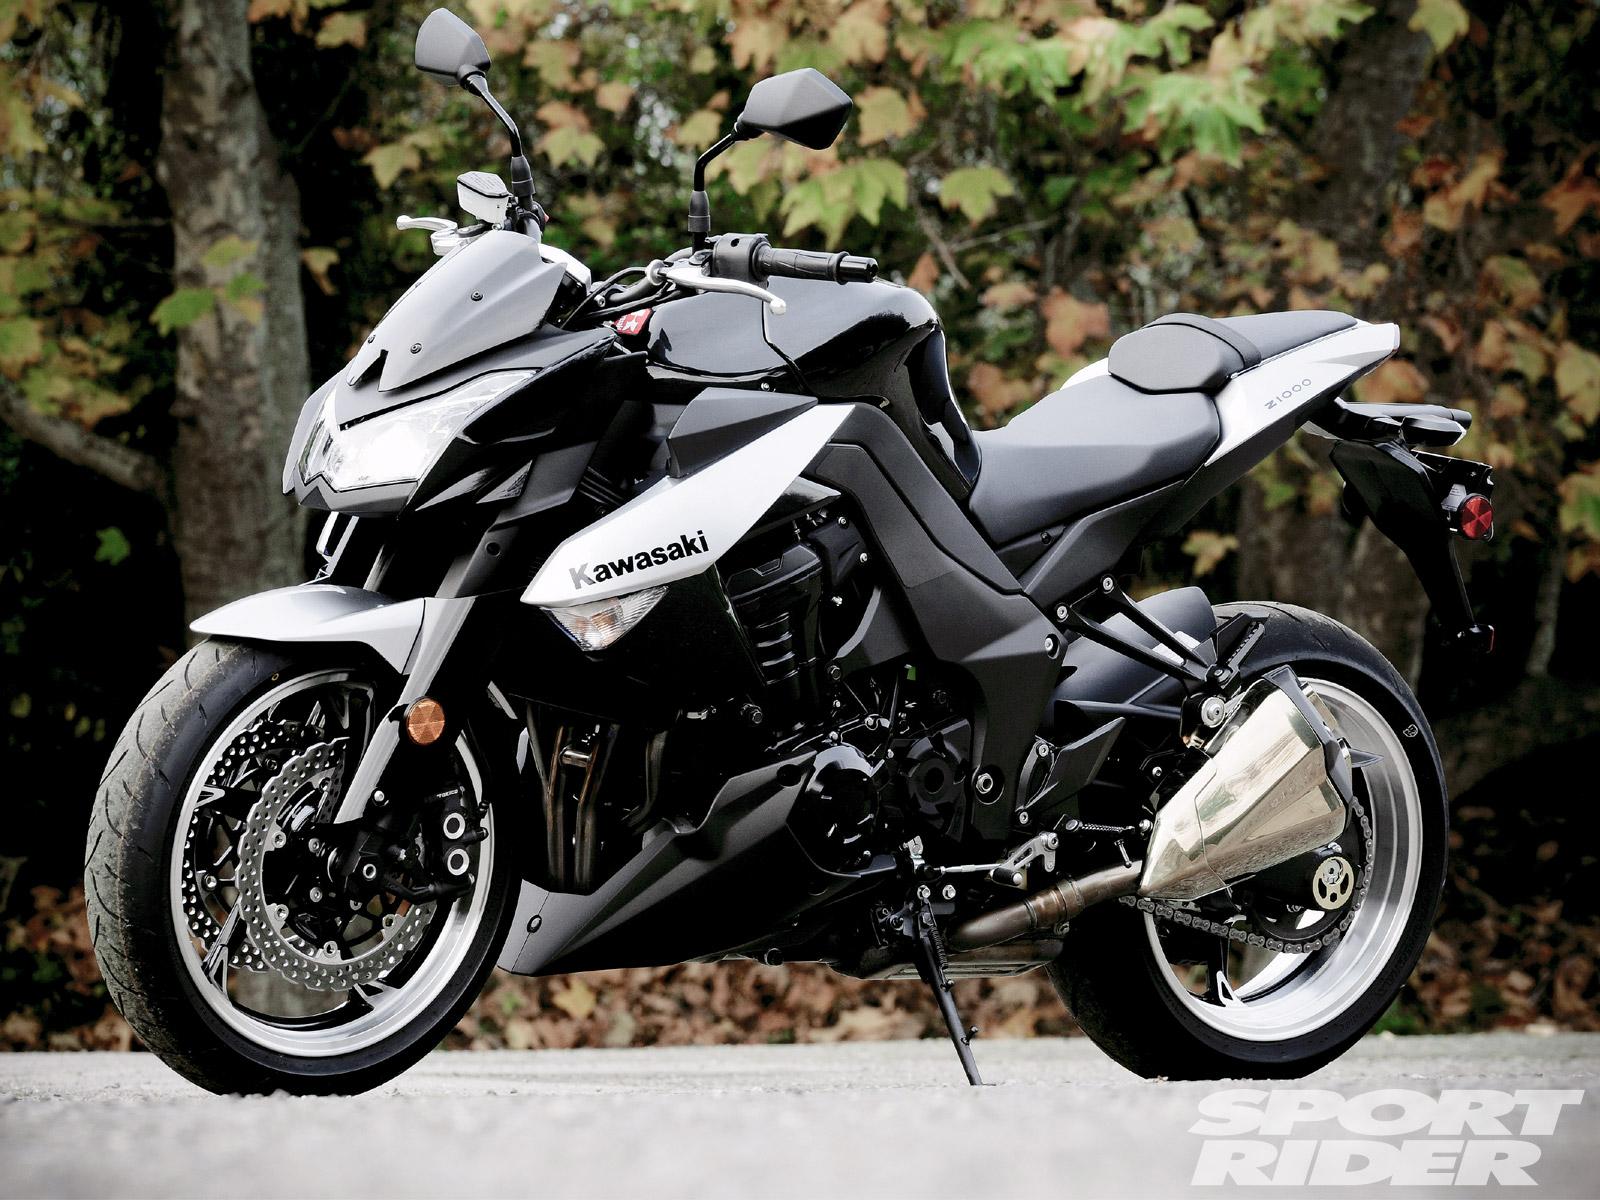 Sdy Bikes: 2012 kawasaki z1000